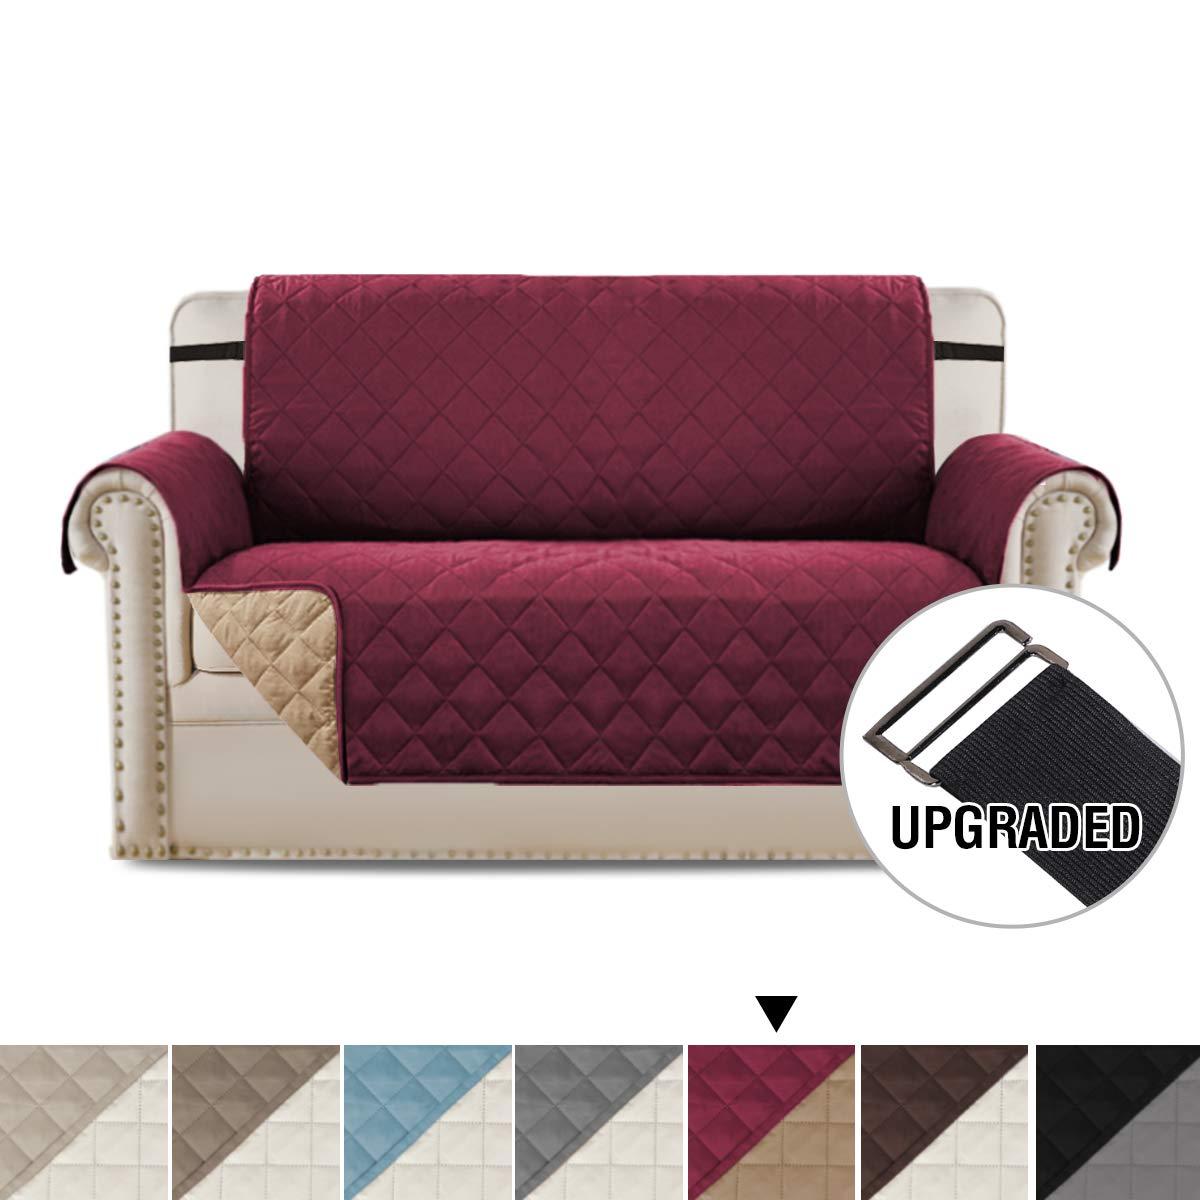 H. Versalitex 豪華な家具のプロテクター ホームファッション リバーシブル キルト 防水 暖かな居心地で効率的 柔らかくスエード調(椅子:バーガンディー/日焼け色)75インチx65インチ Love Seat - 75